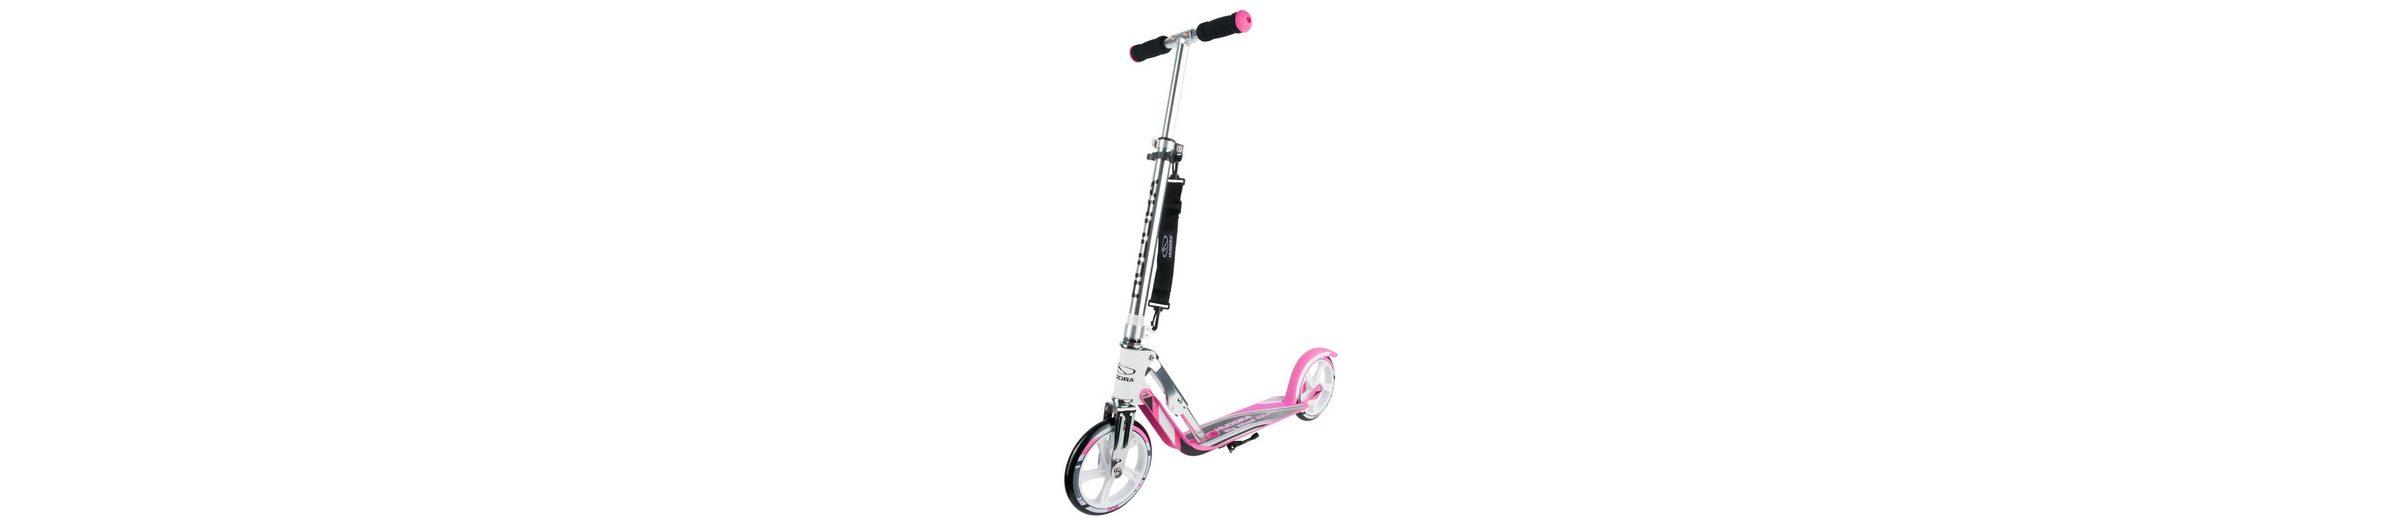 Hudora Scooter, »Big Wheel RX-Pro 205 weiß-pink«